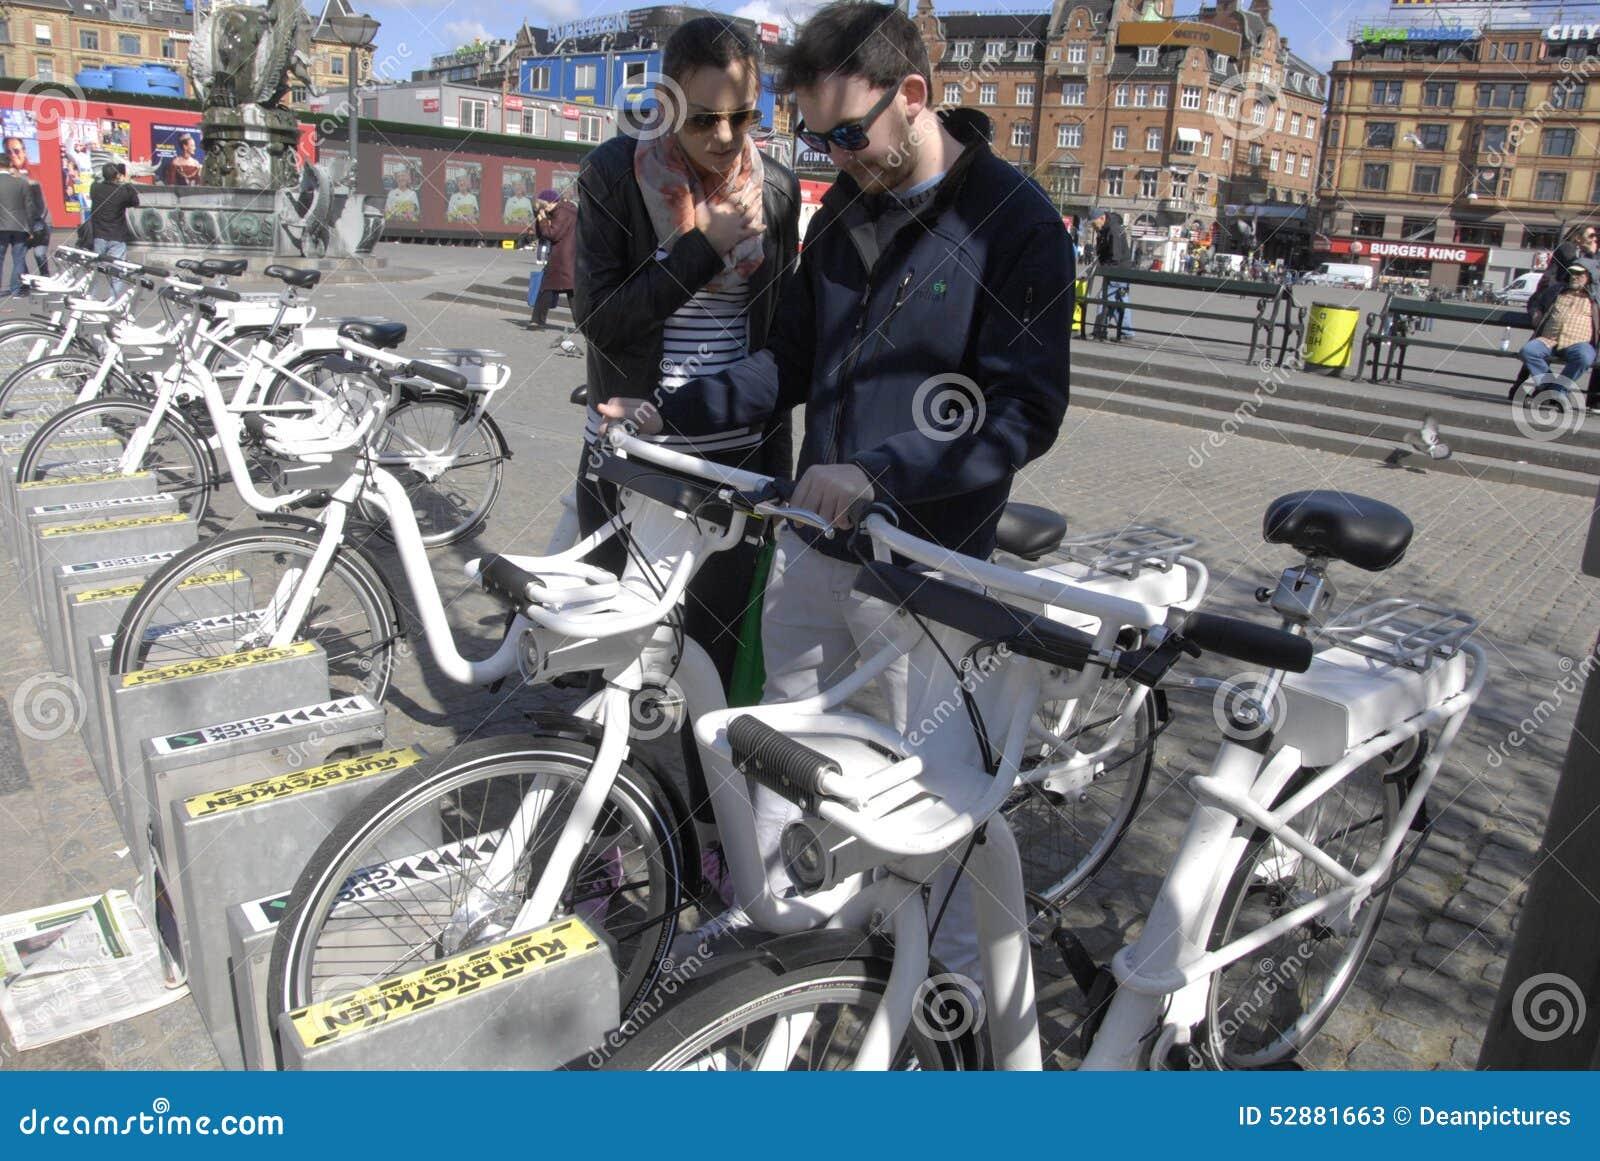 Copenhagen Electric City Bikes Editorial Stock Photo Image 52881663